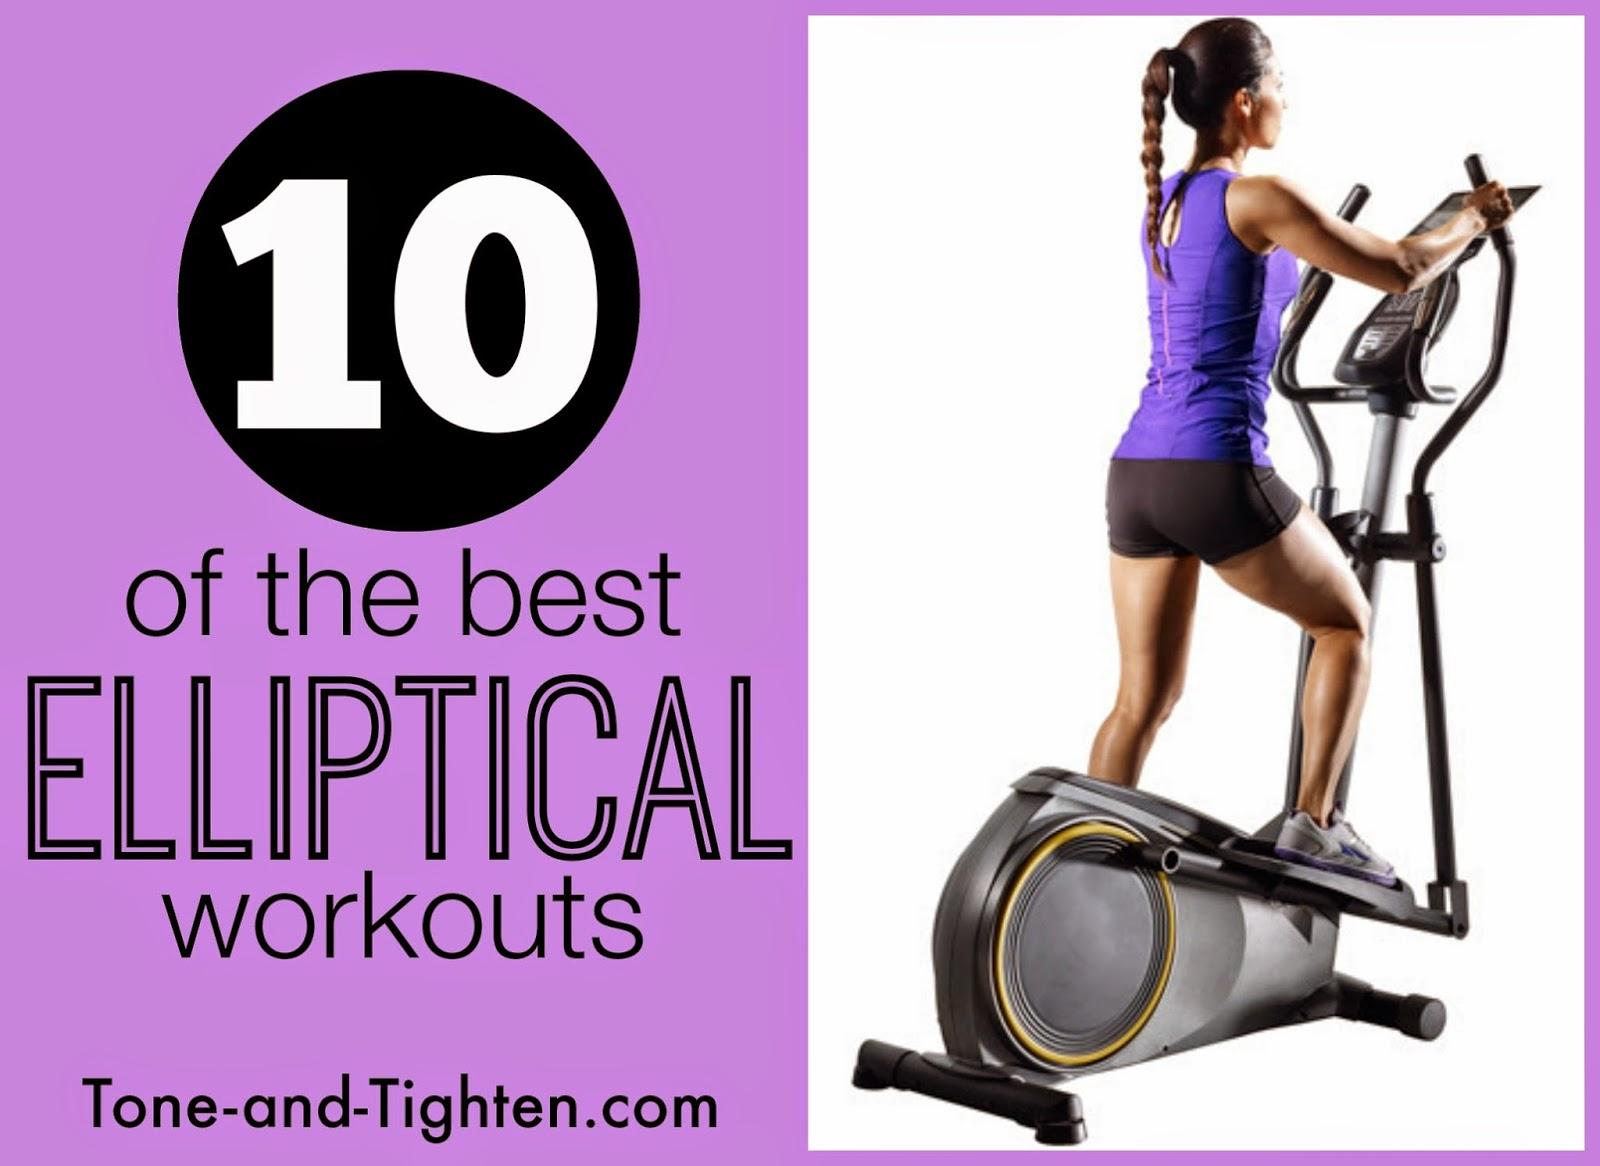 Hiit Elliptical Workouts 4 Times A Week